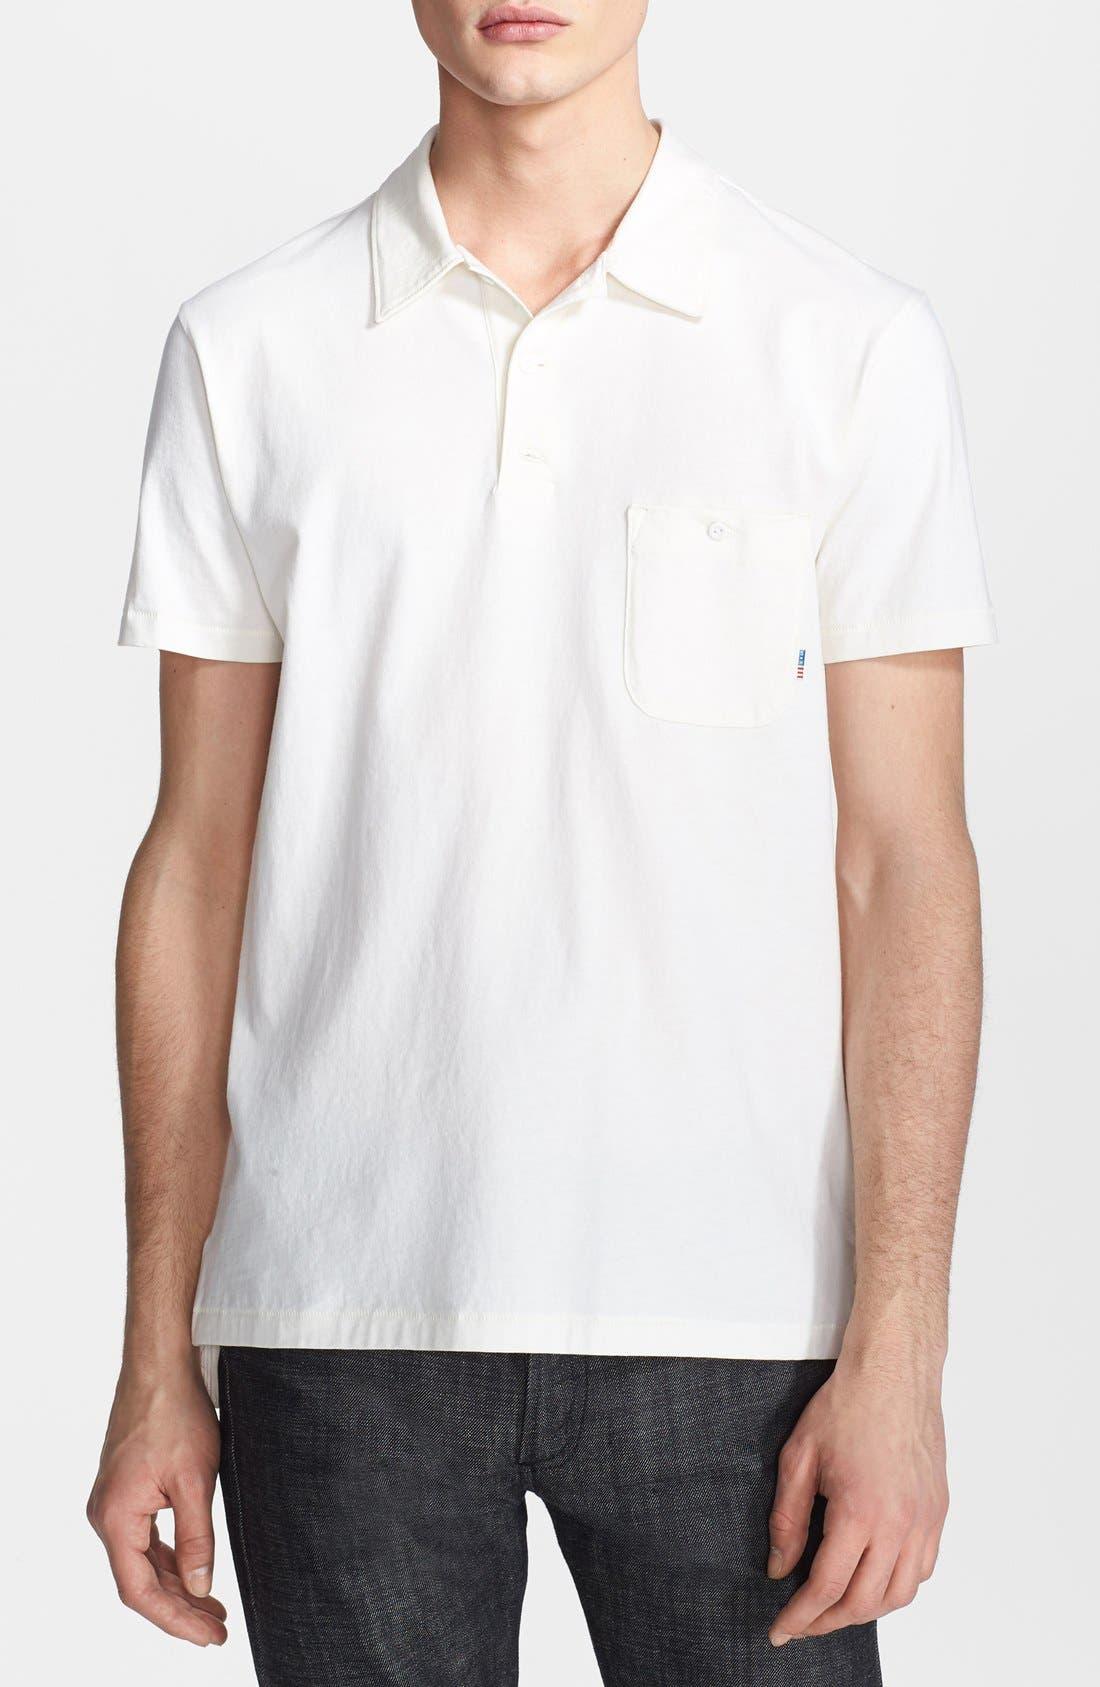 Main Image - Shipley & Halmos 'Regent' Cotton Jersey Polo